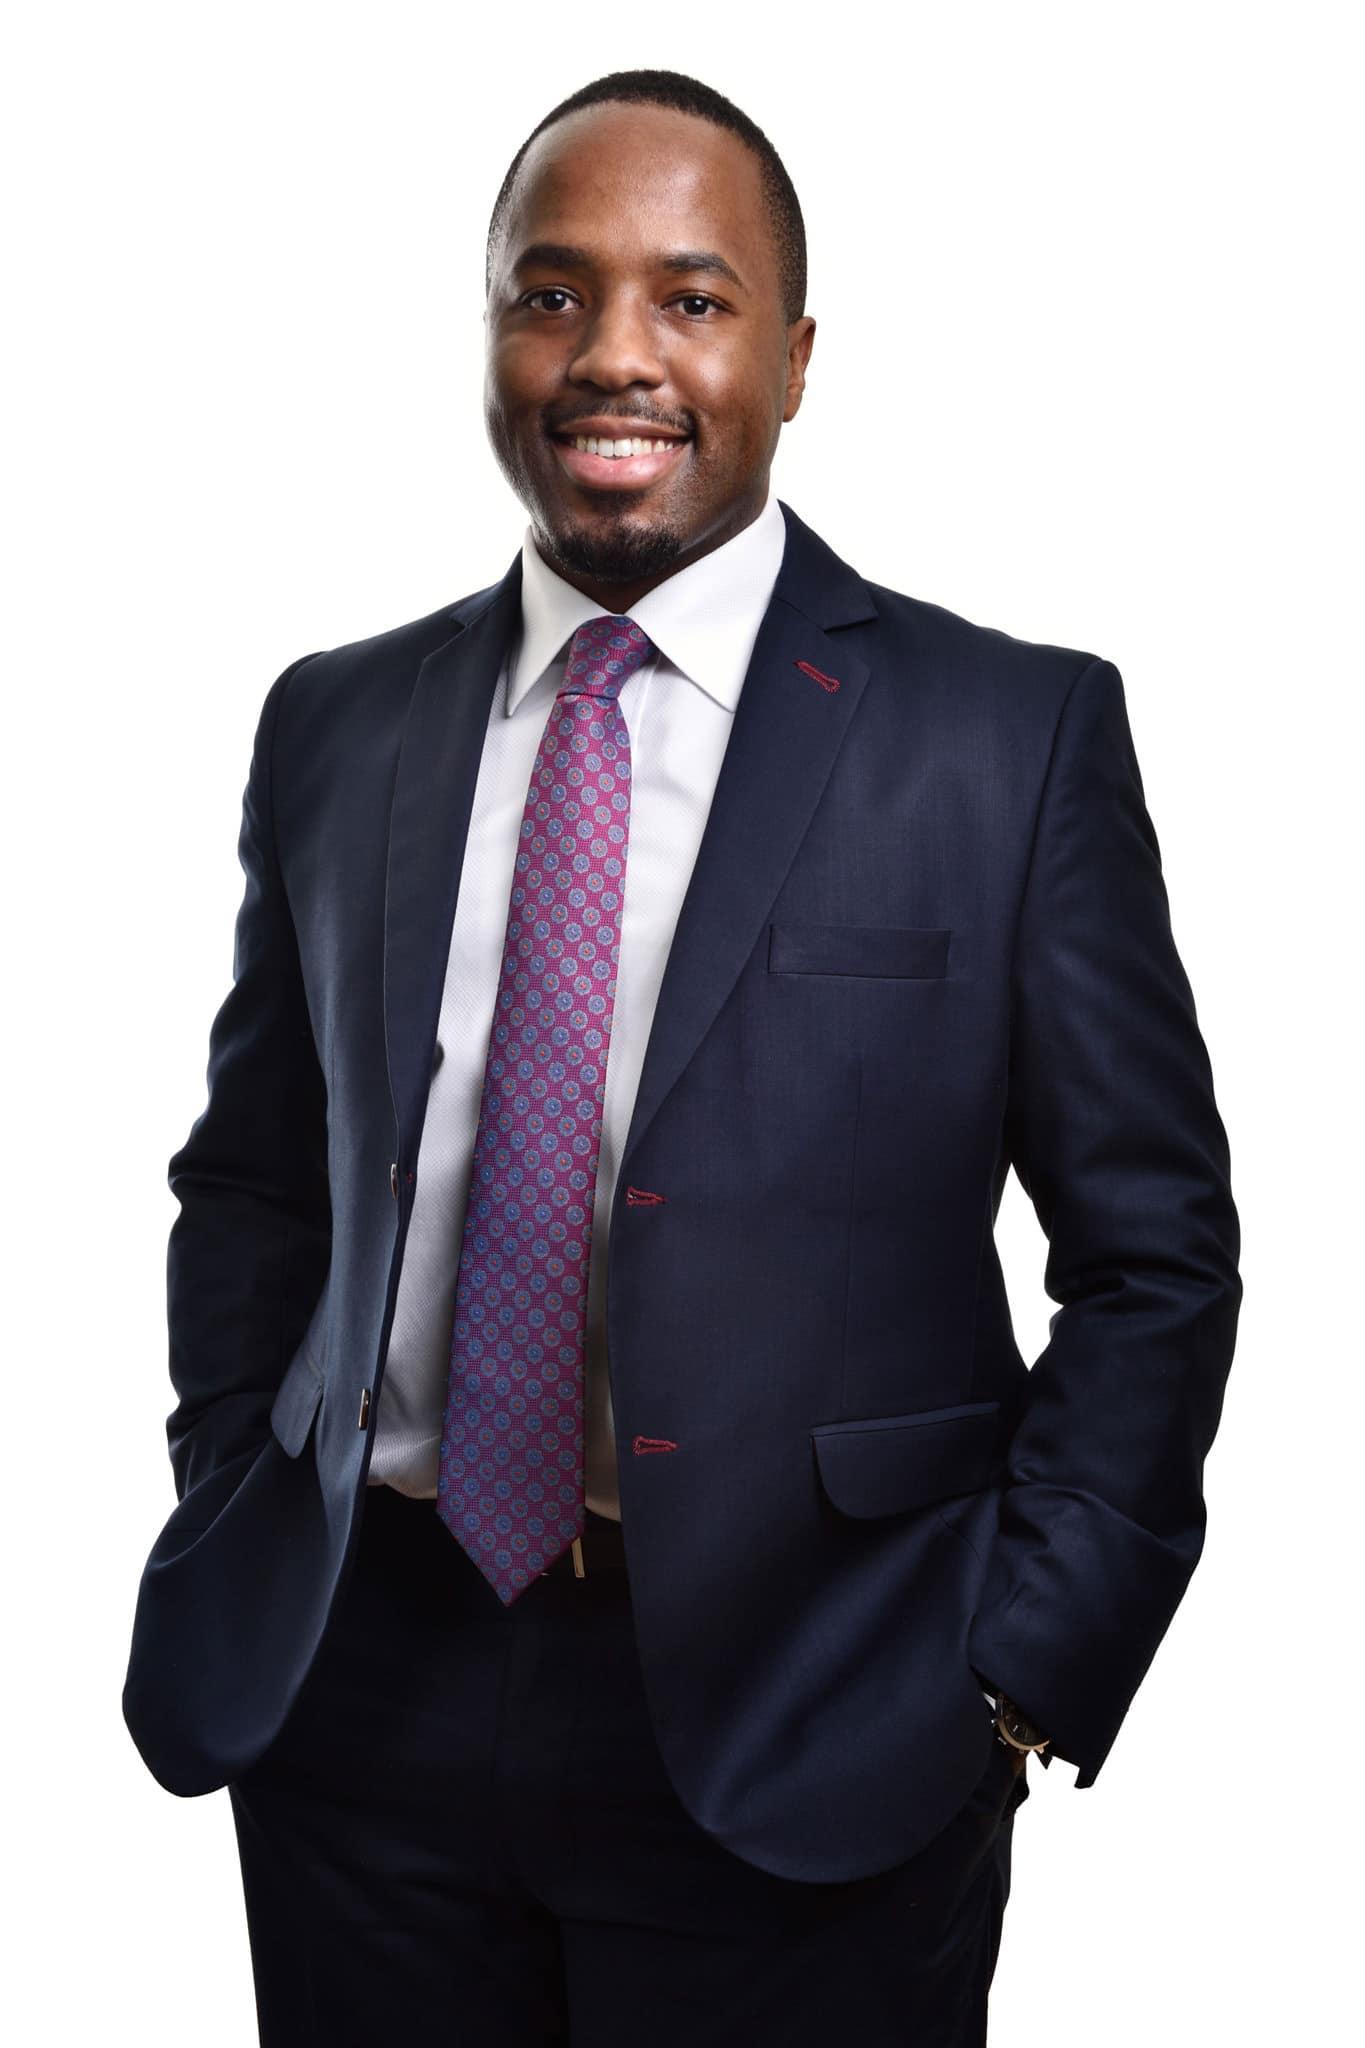 Headshot - Sandown, Johannesburg - Finance Guru